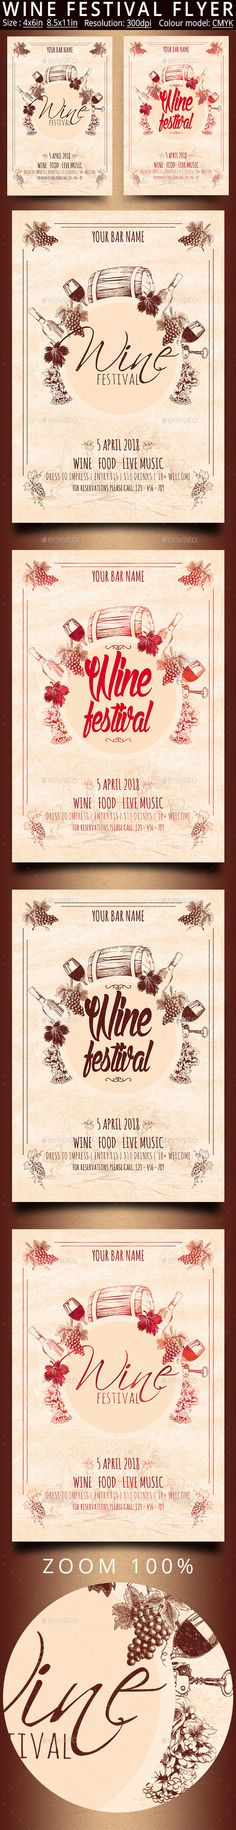 Wine Festival Vintage Flyer Template PSD